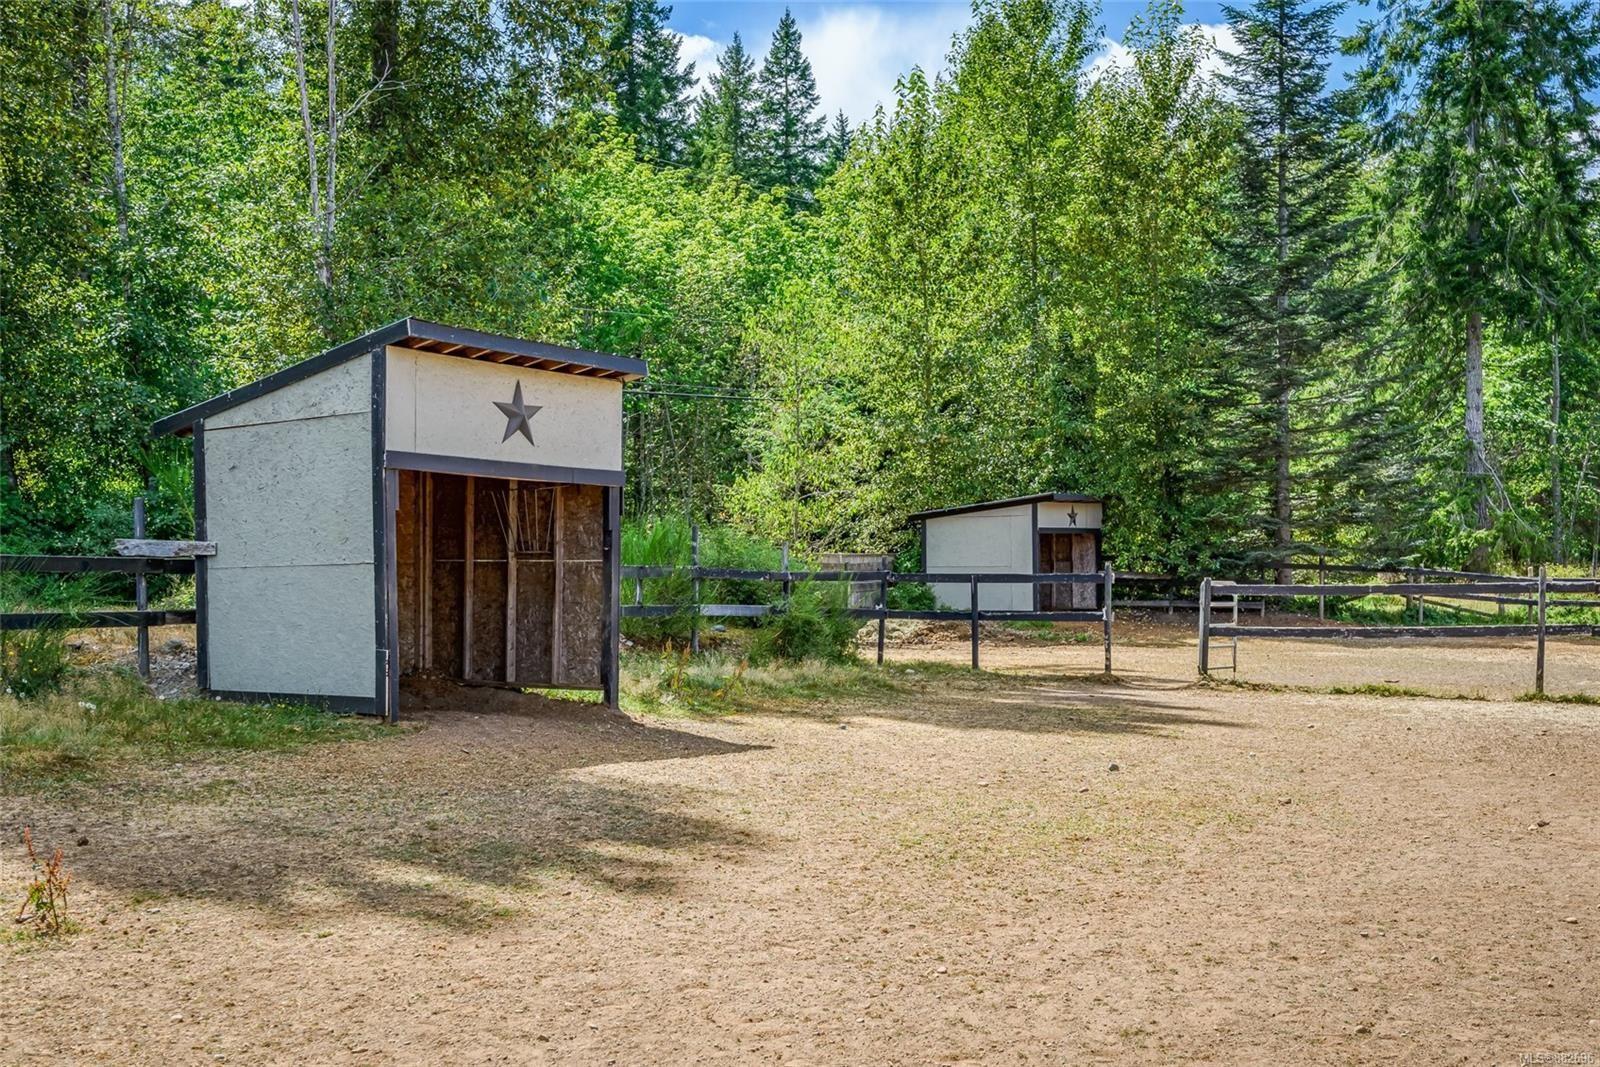 Photo 31: Photos: 3554 MacAulay Rd in : CV Merville Black Creek House for sale (Comox Valley)  : MLS®# 882696